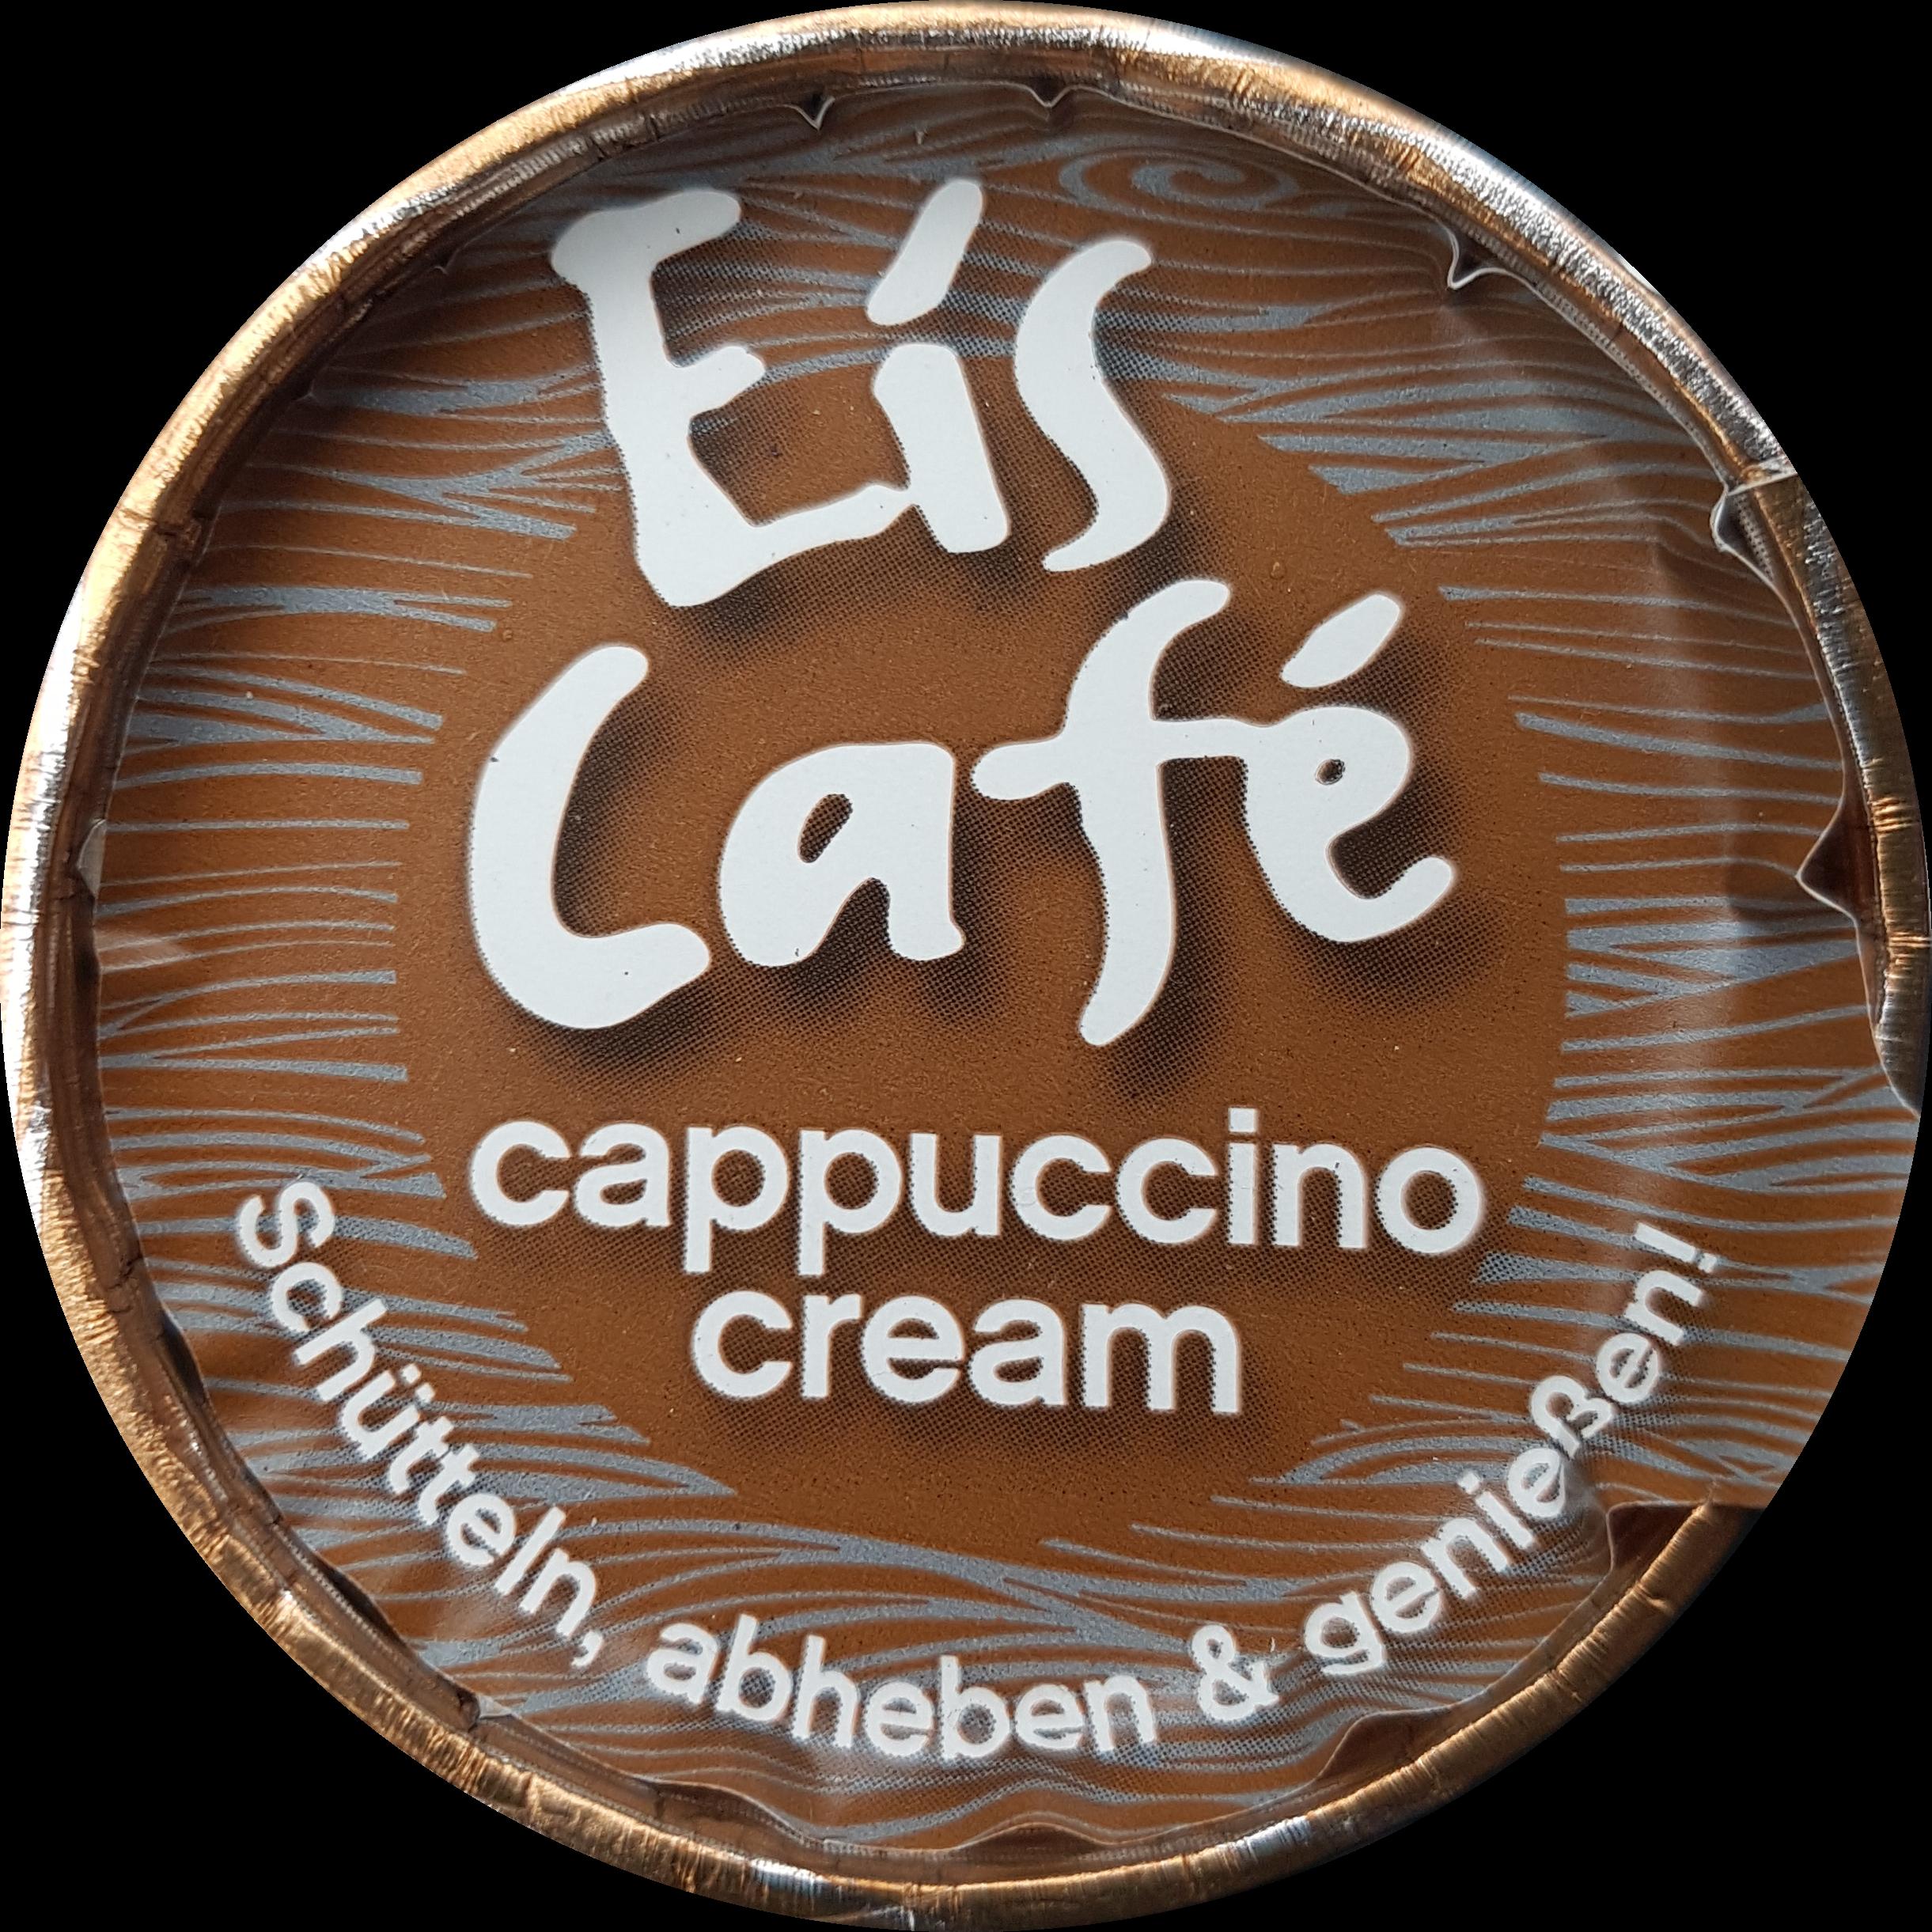 Maresi Eis Café cappuccino cream top - itstartswithacoffee.com #coffee #eiscafe #icecappuccino #cappucino #maresi